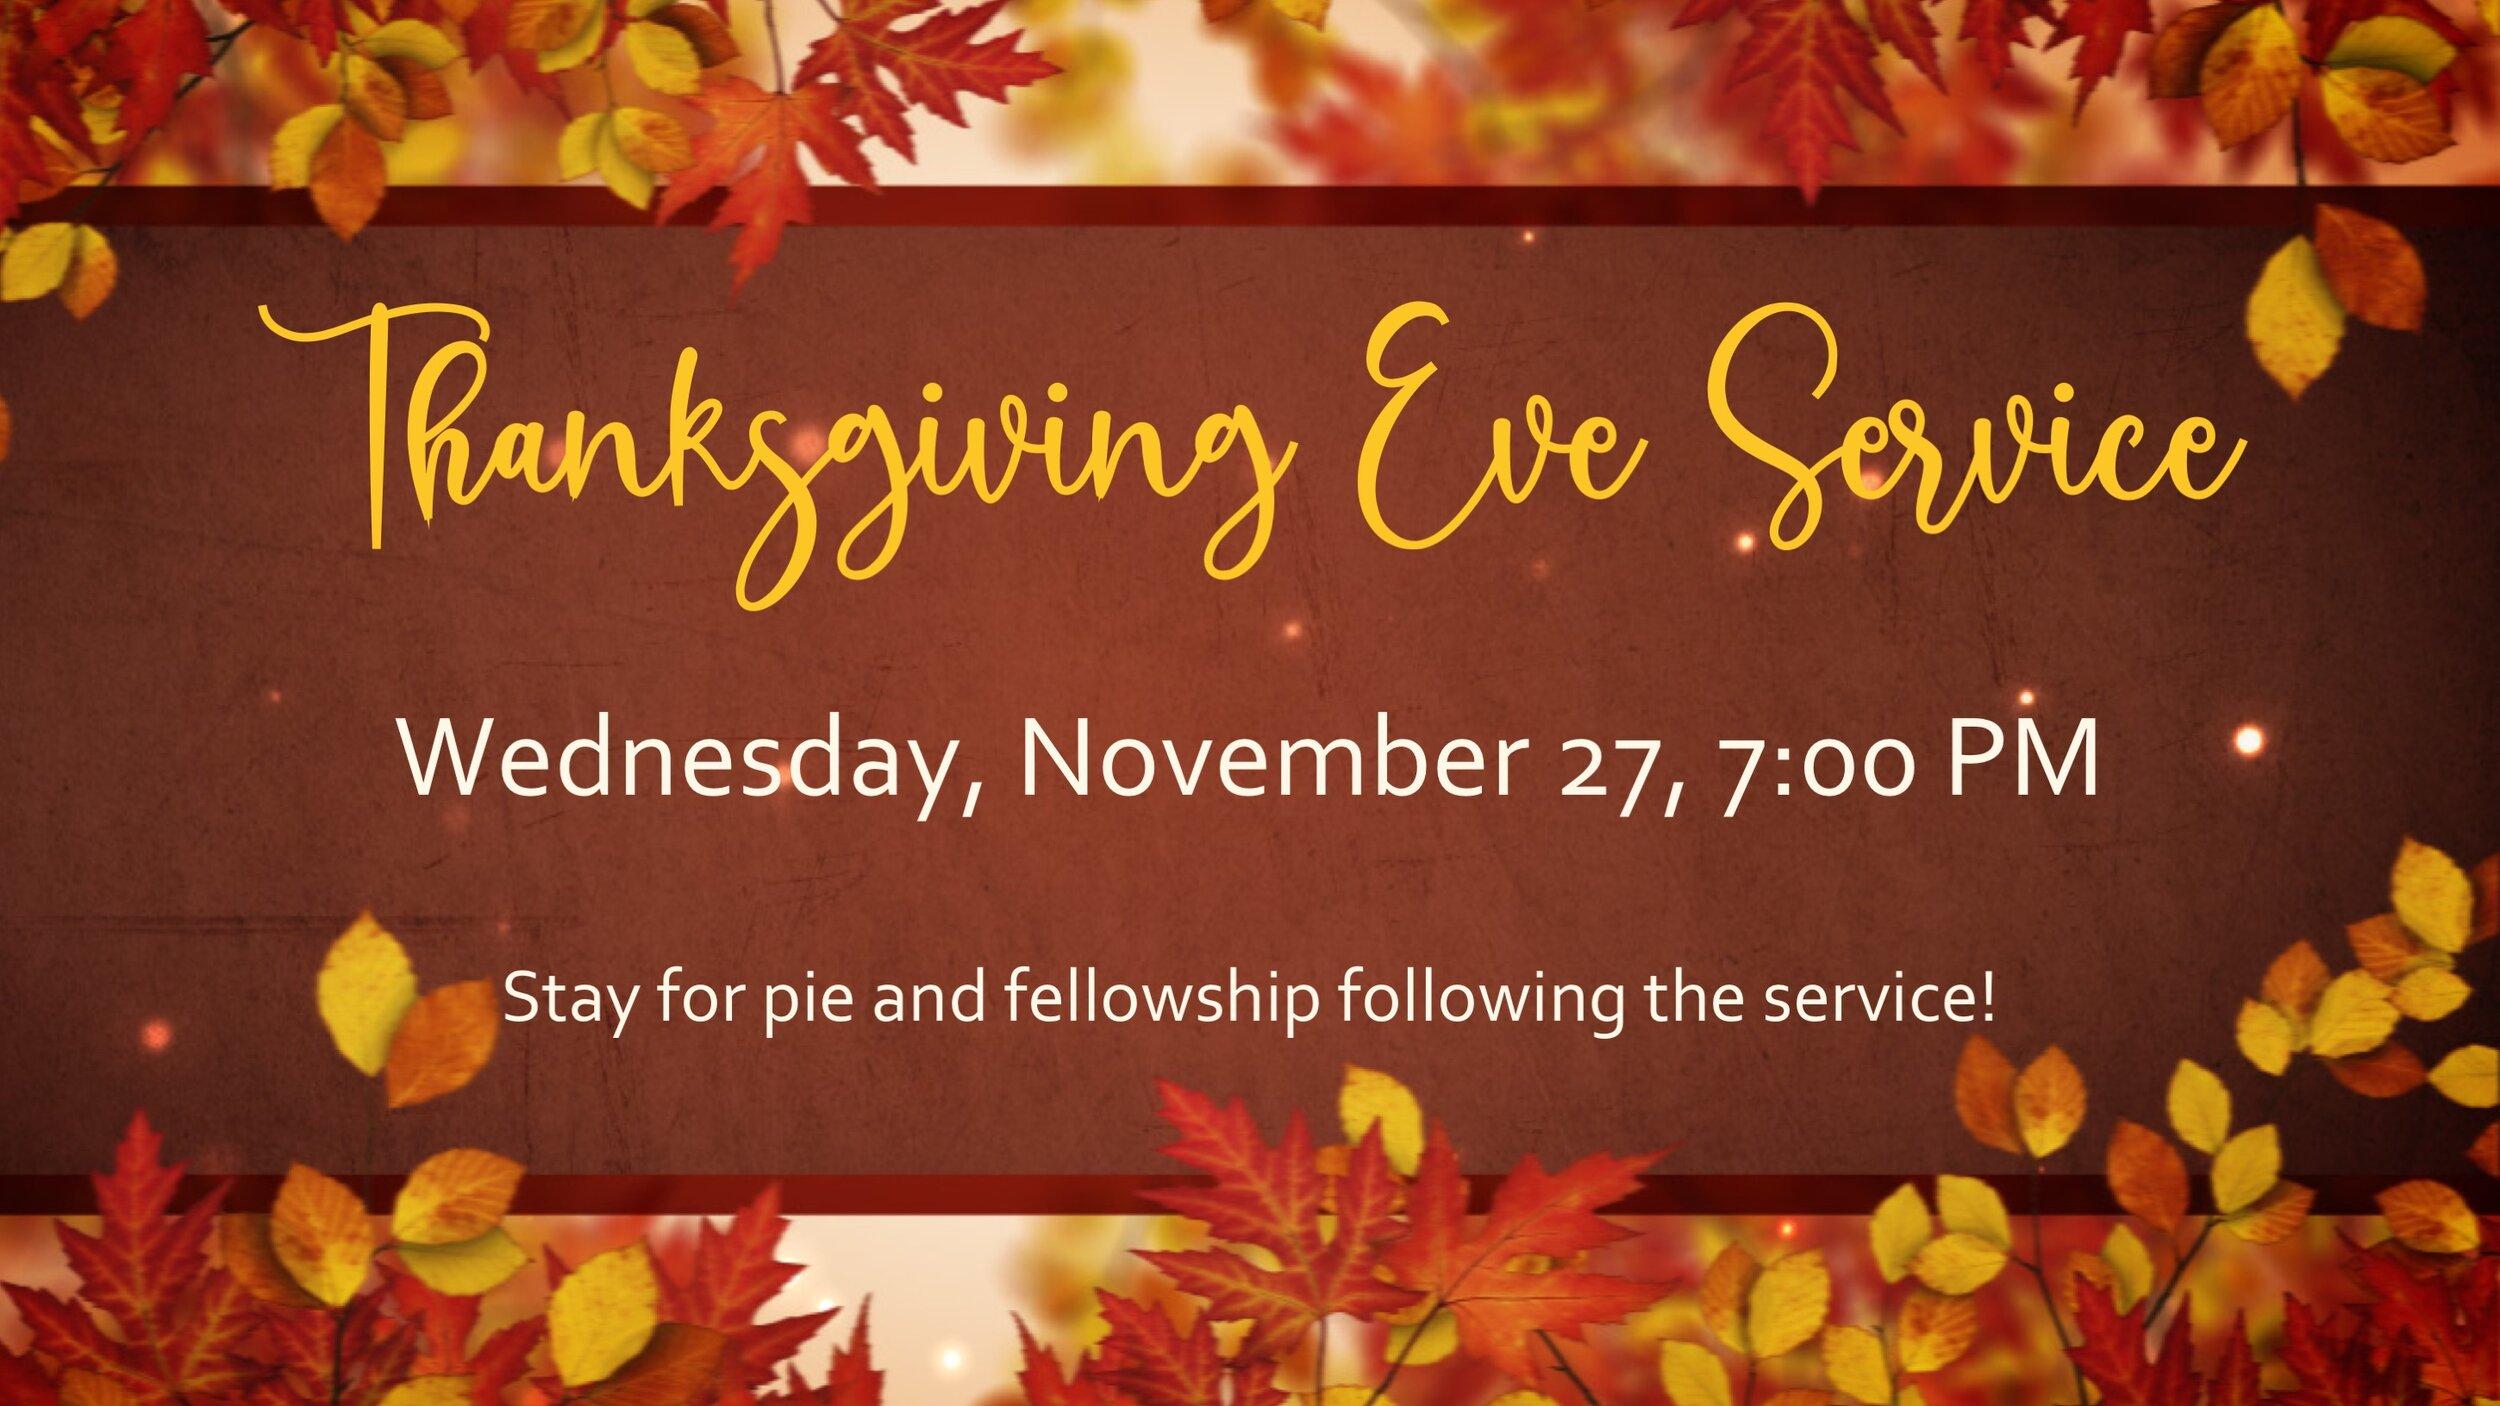 Thanksgiving Eve Service 2019 16x9.jpg